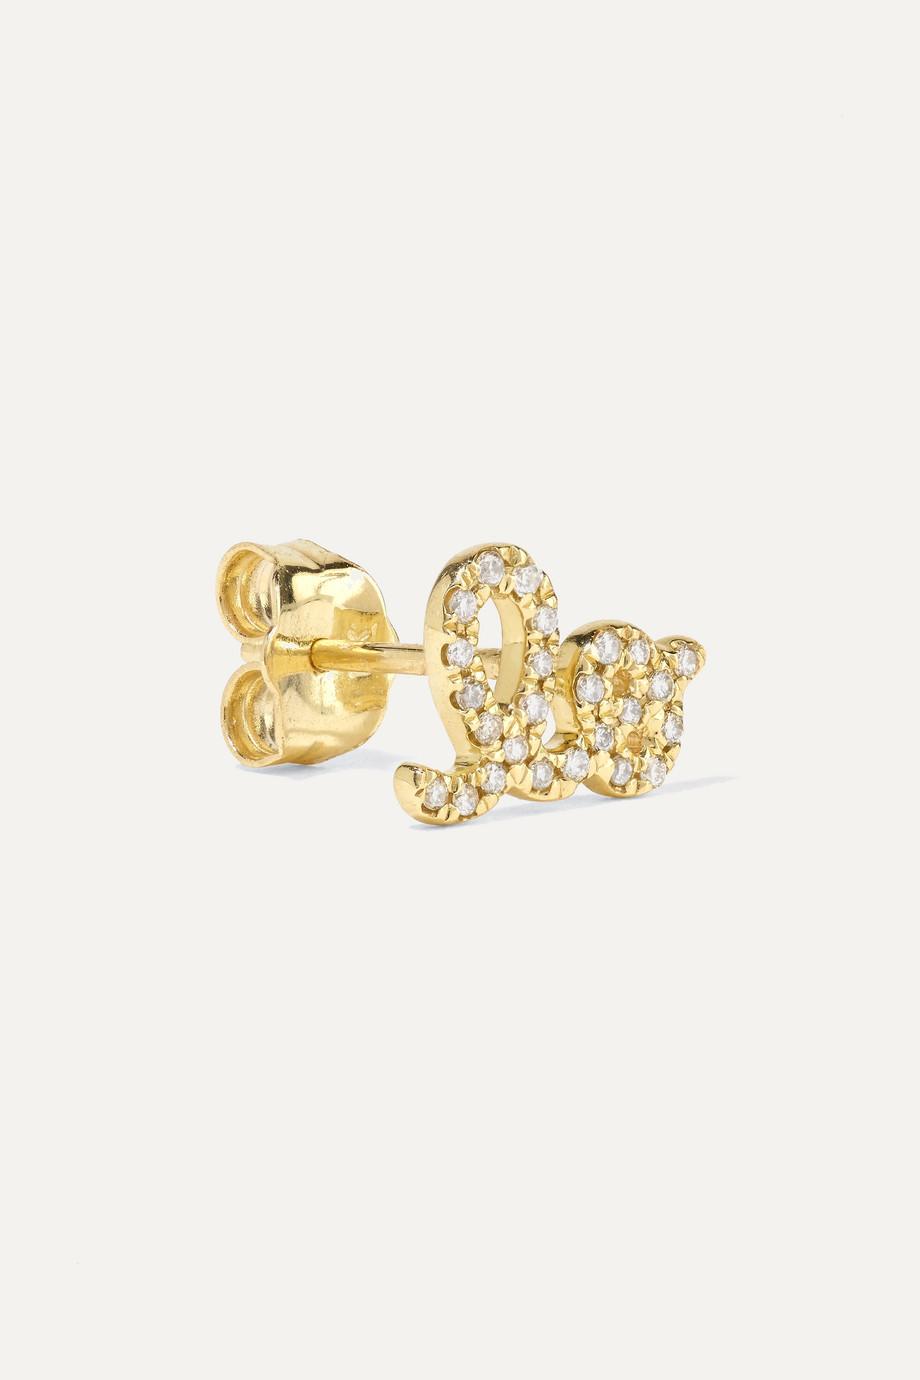 Sydney Evan Love 14-karat gold diamond earrings